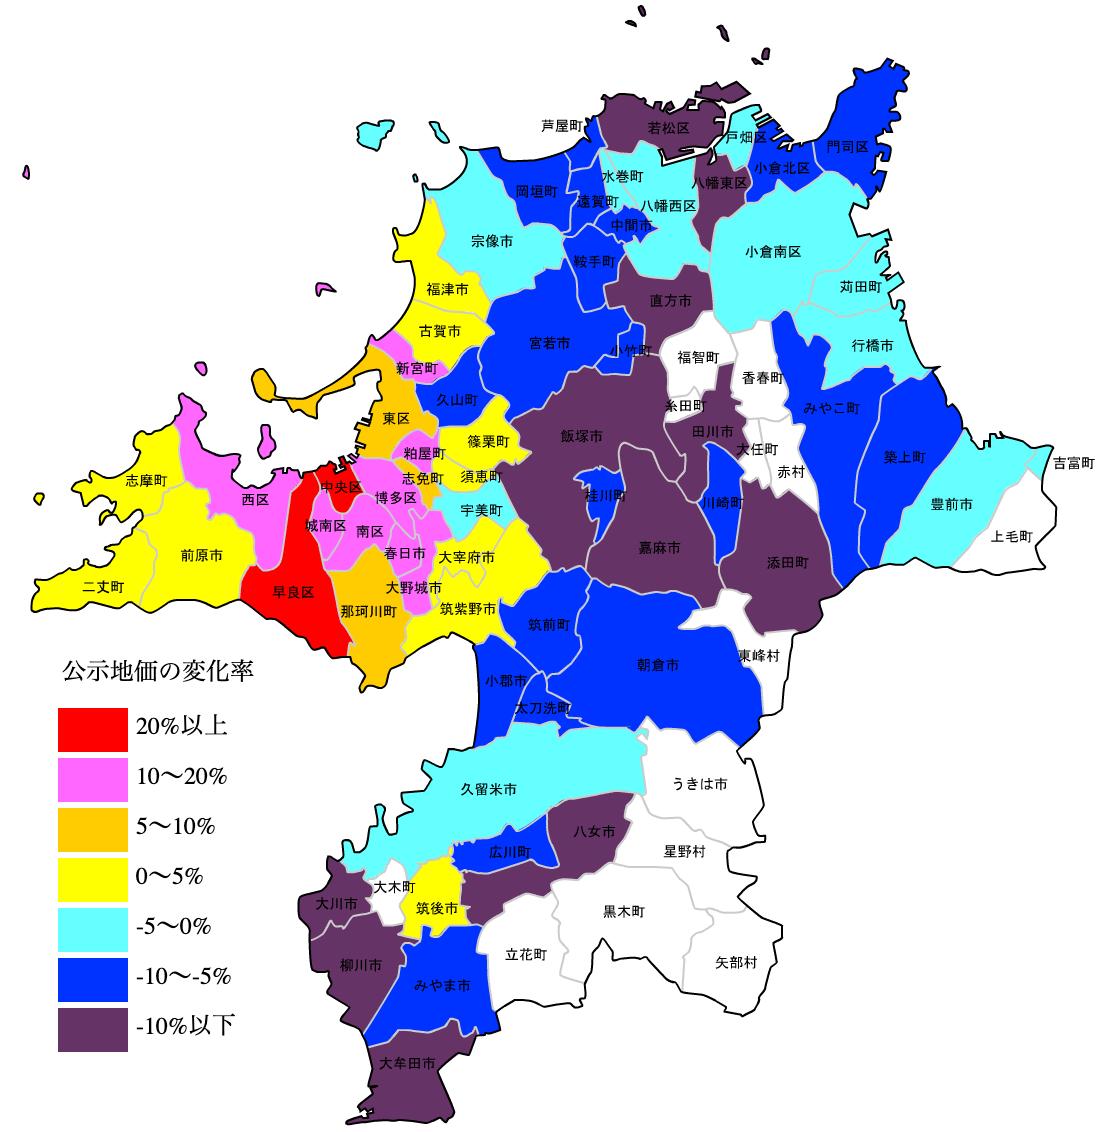 福岡県の公示地価の変化率図 H25-H31